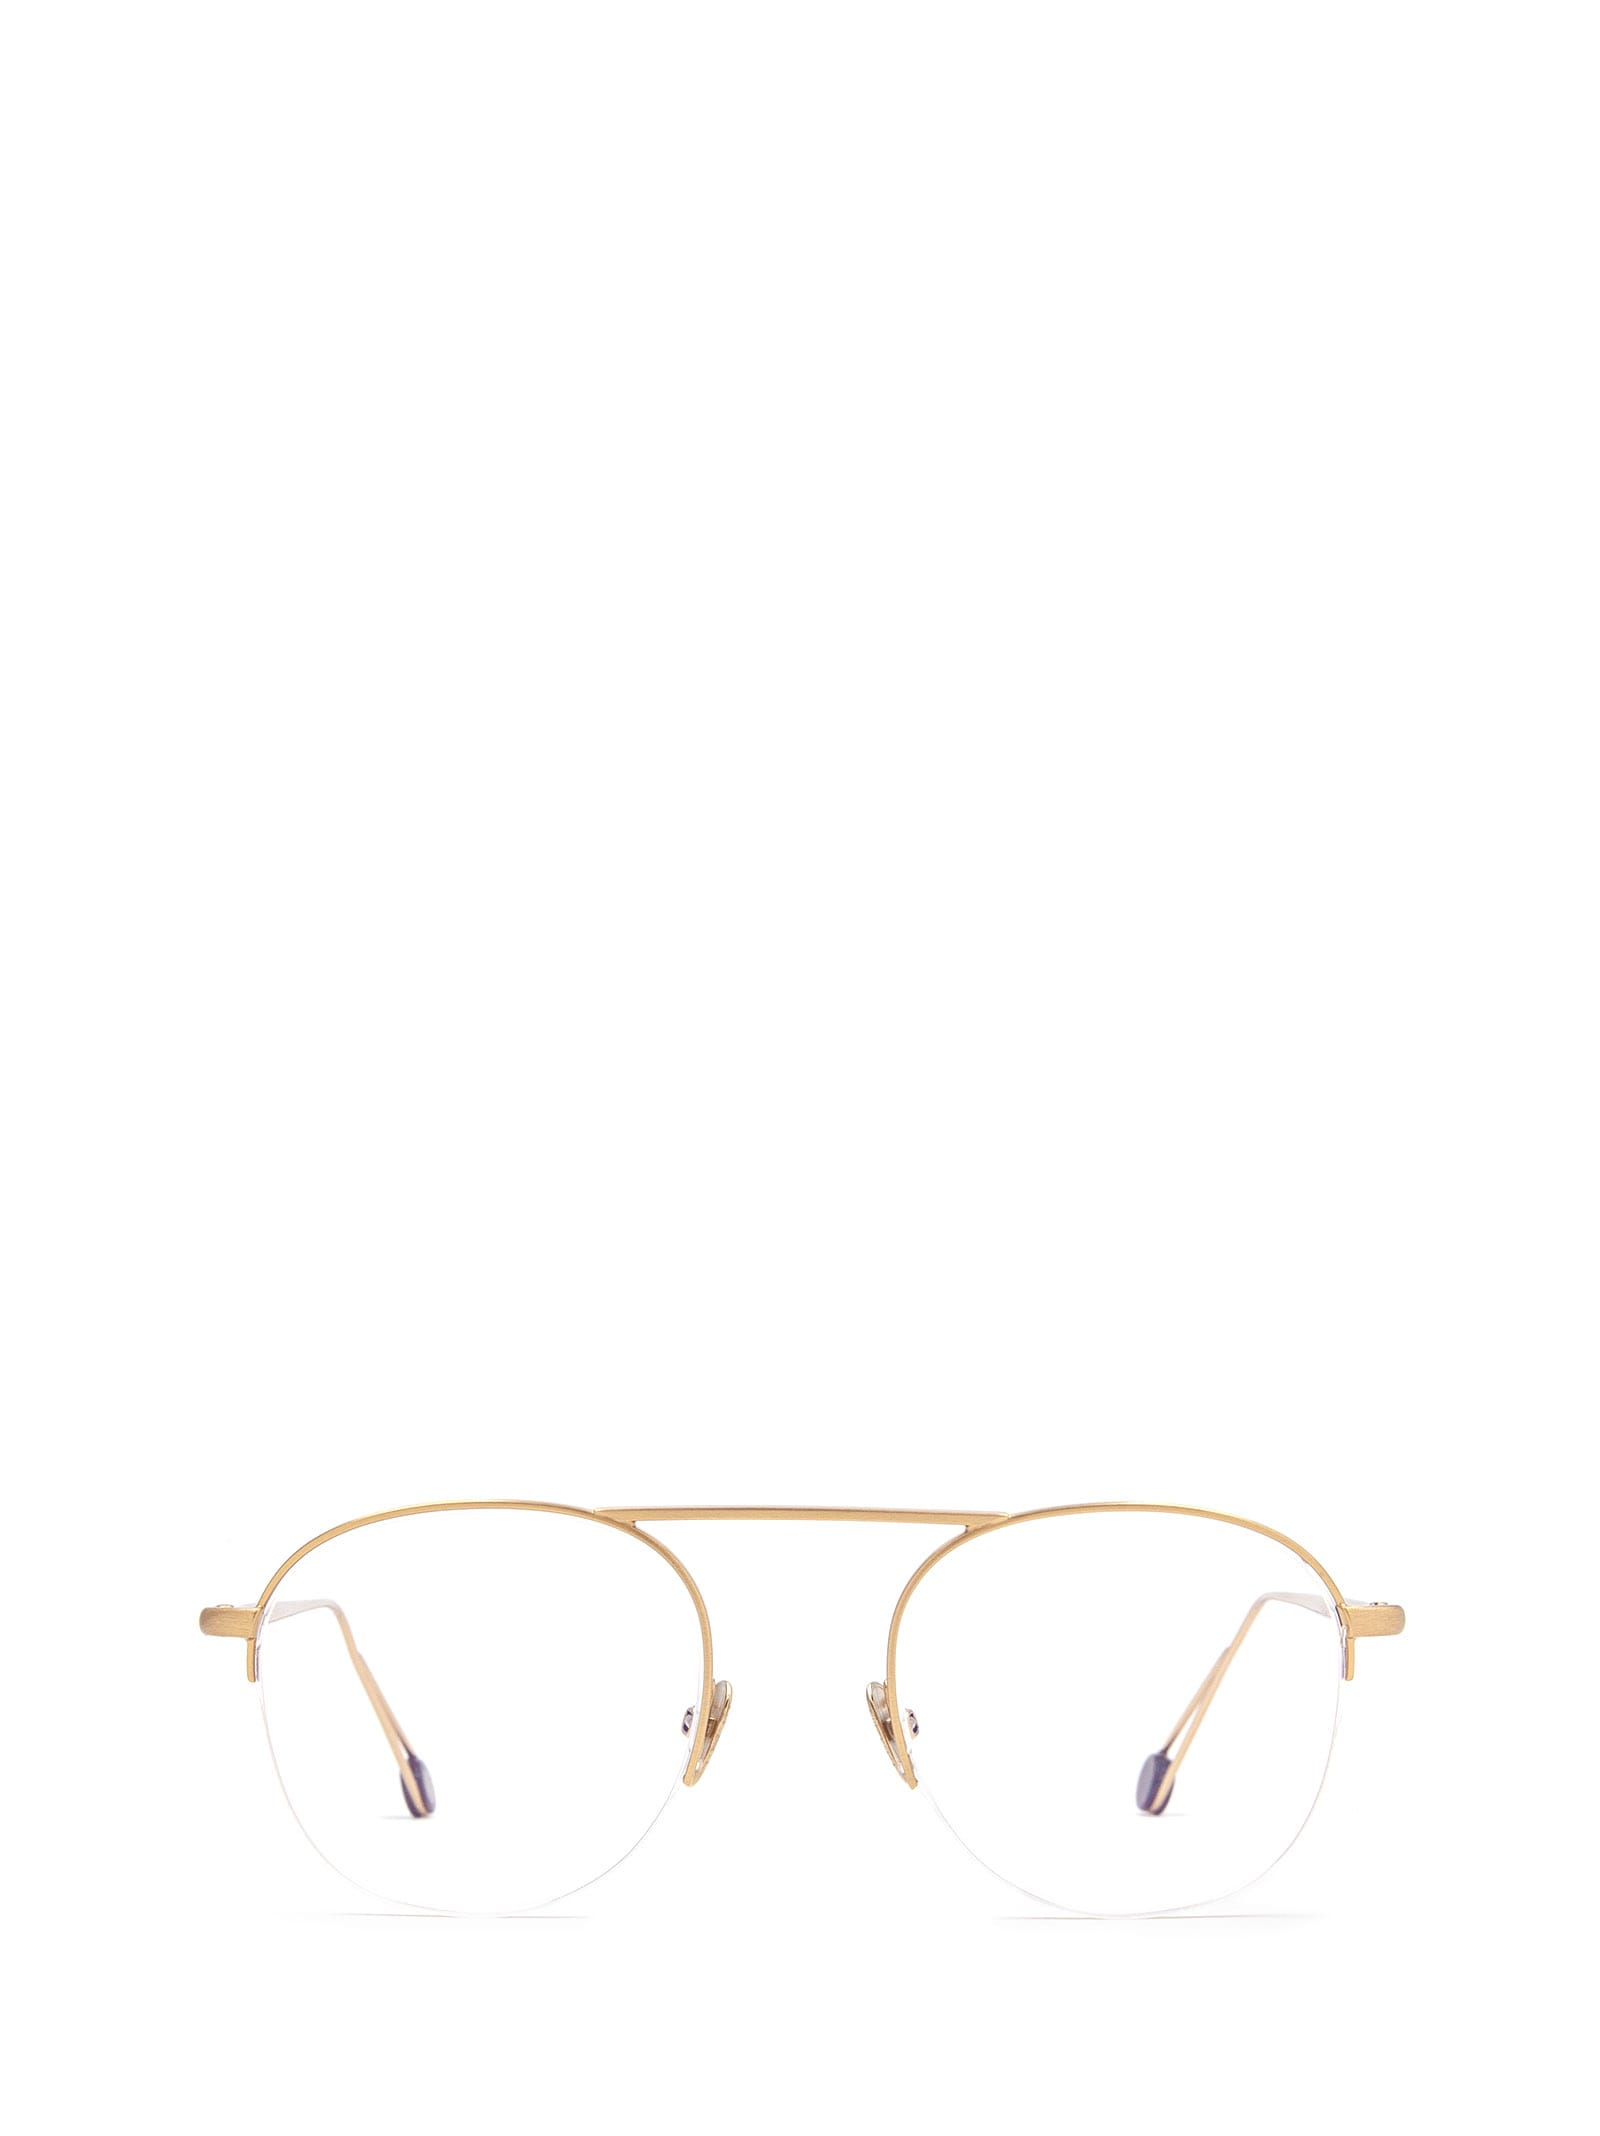 AHLEM Ahlem Voltaire Rose Gold Brushed Glasses